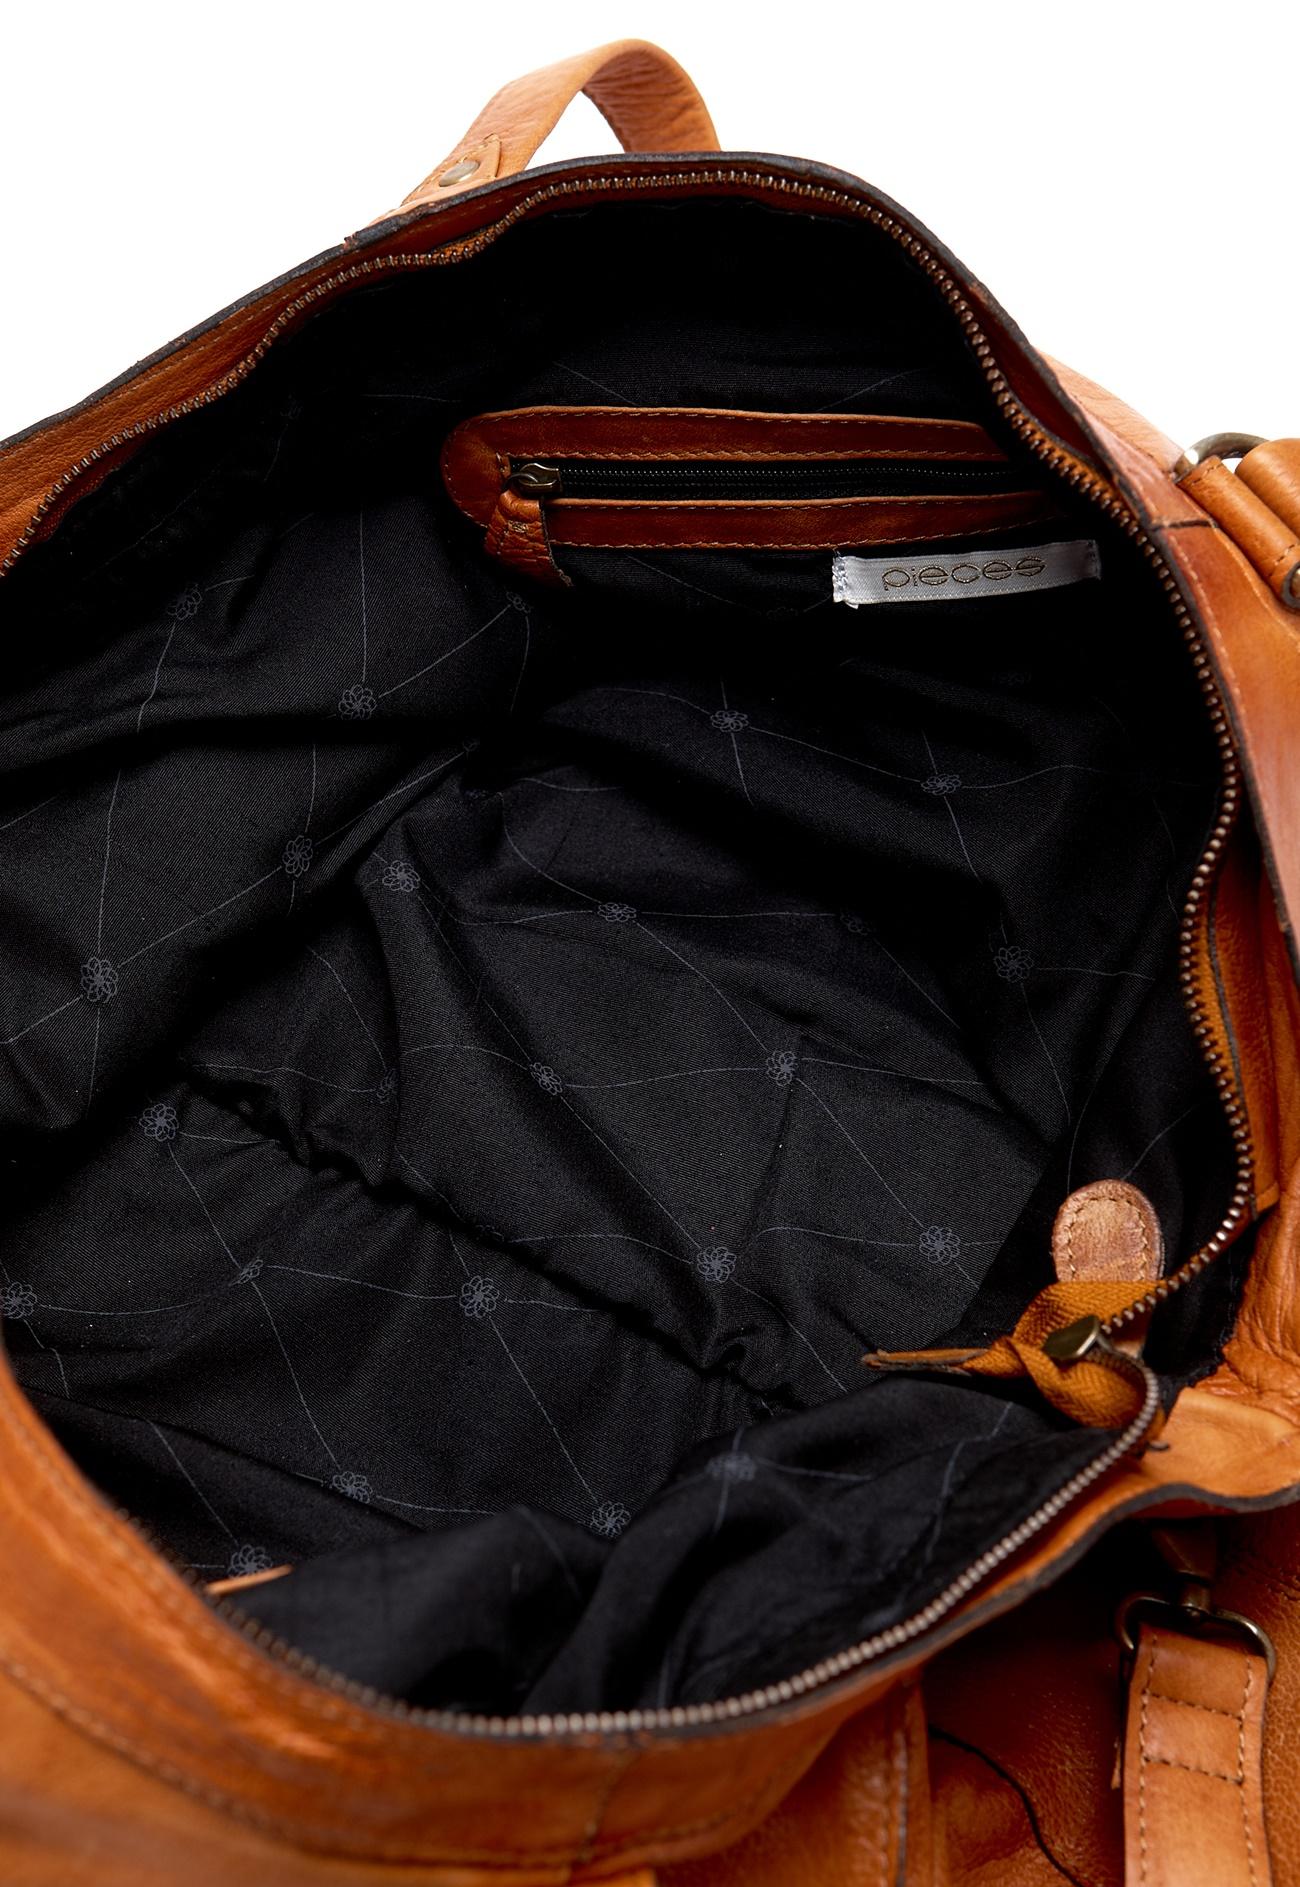 Pieces Laukut Netistä : Pieces totally royal travel bag konjakki bubbleroom